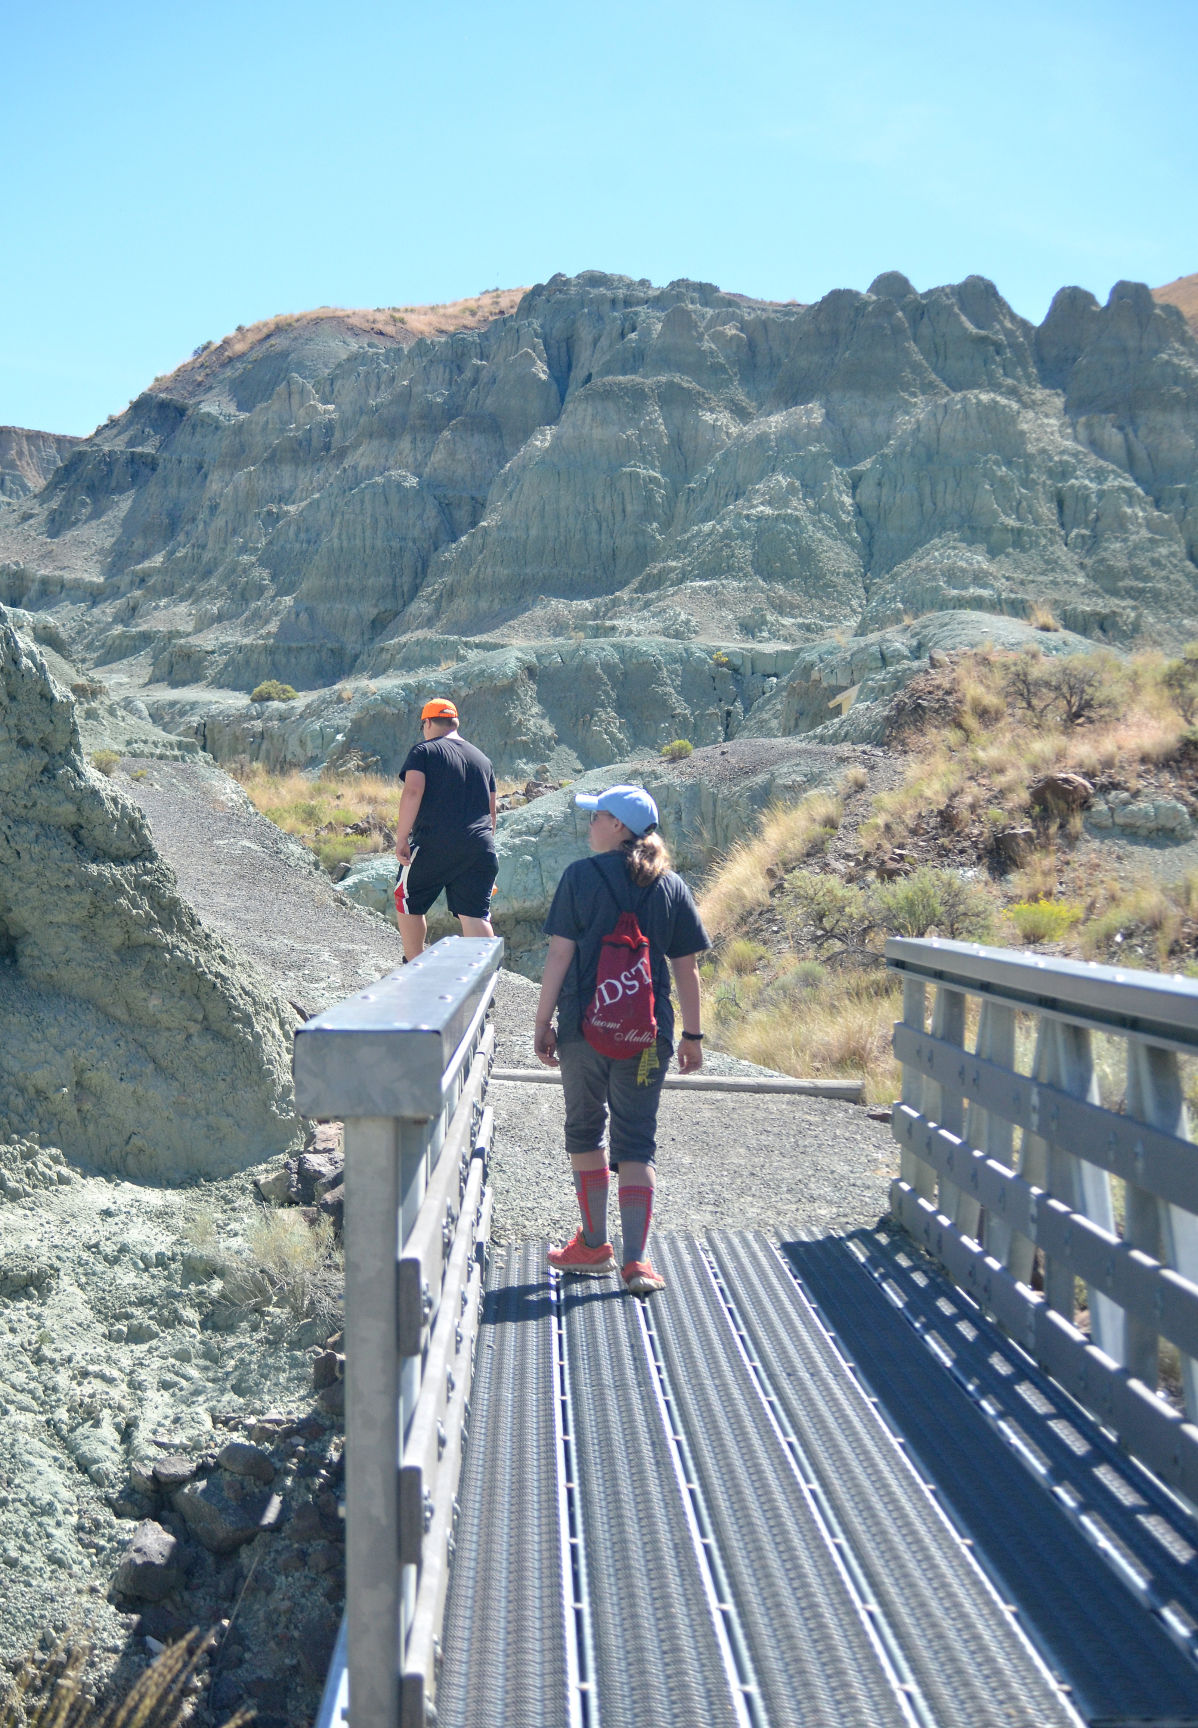 Blue Basin hike holds hidden treasure